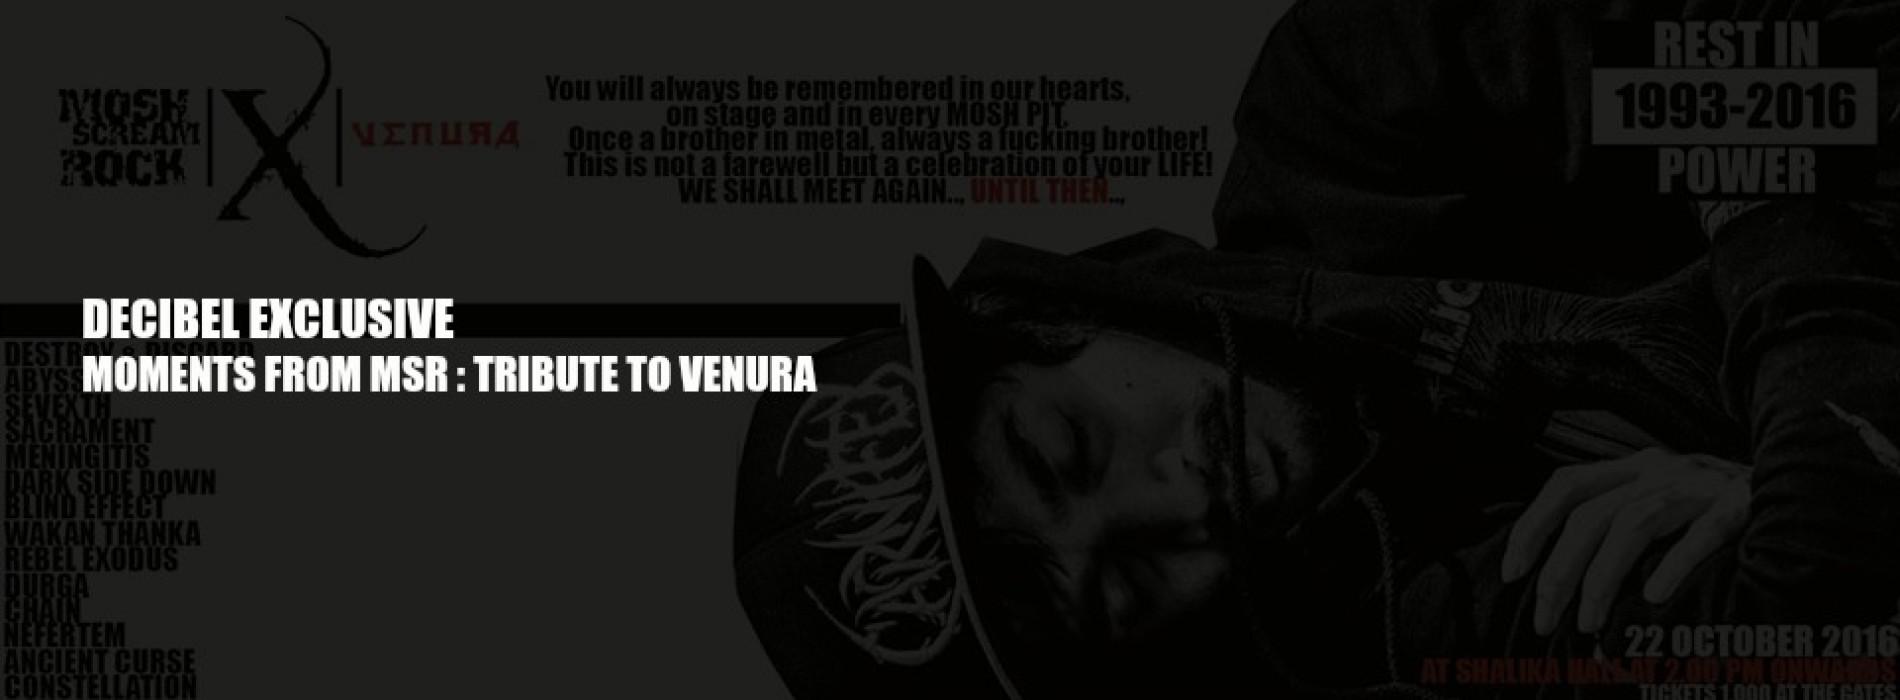 Decibel Exclusive : Moments From MSR (Tribute To Venura)